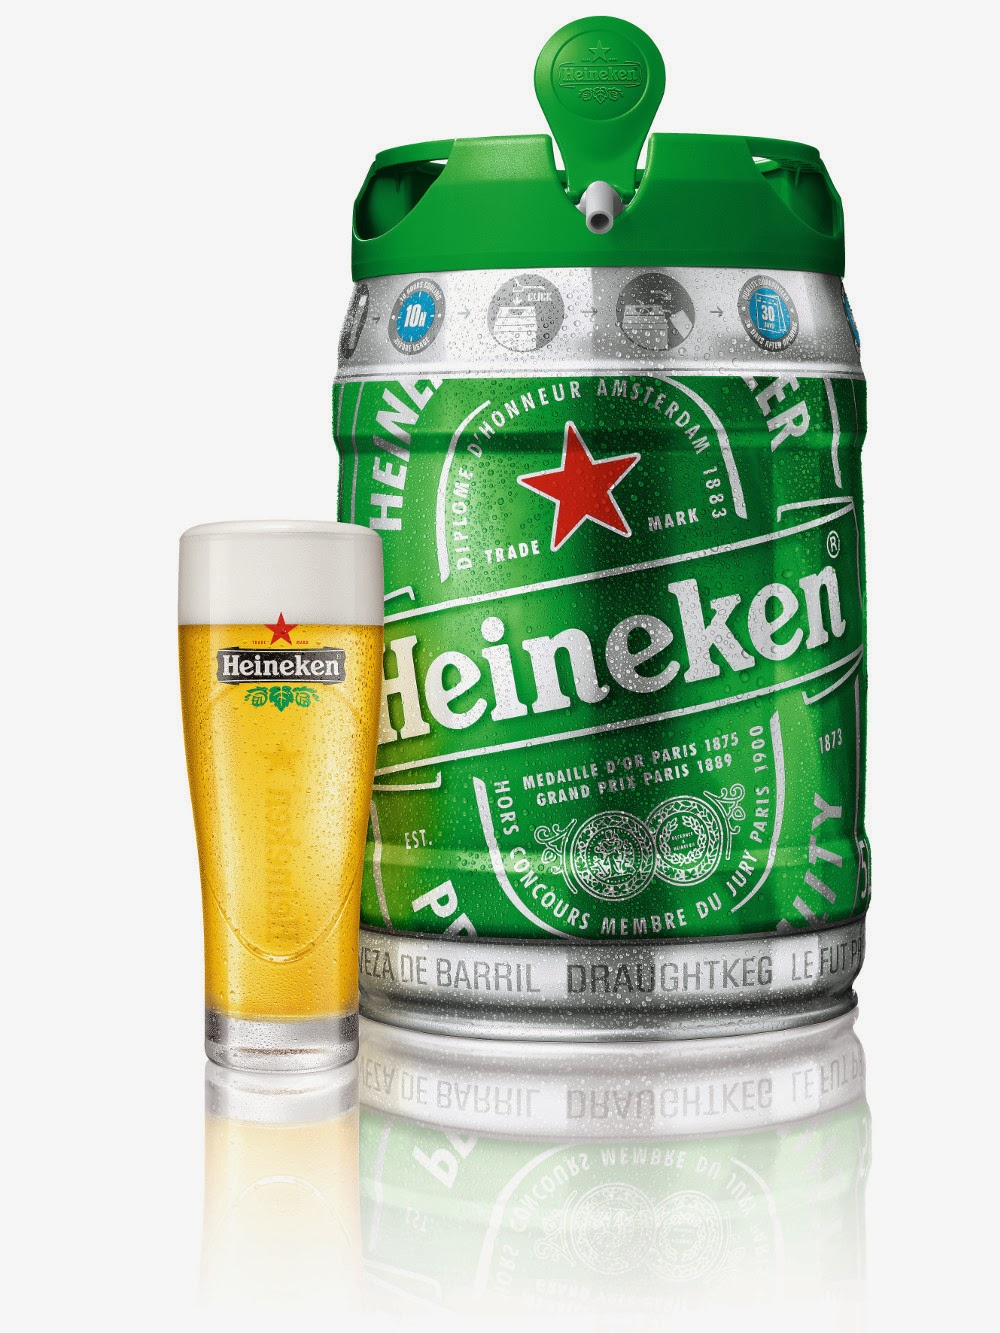 KtheBLOGGER.com: Heineken Illuminates Your Festive Season